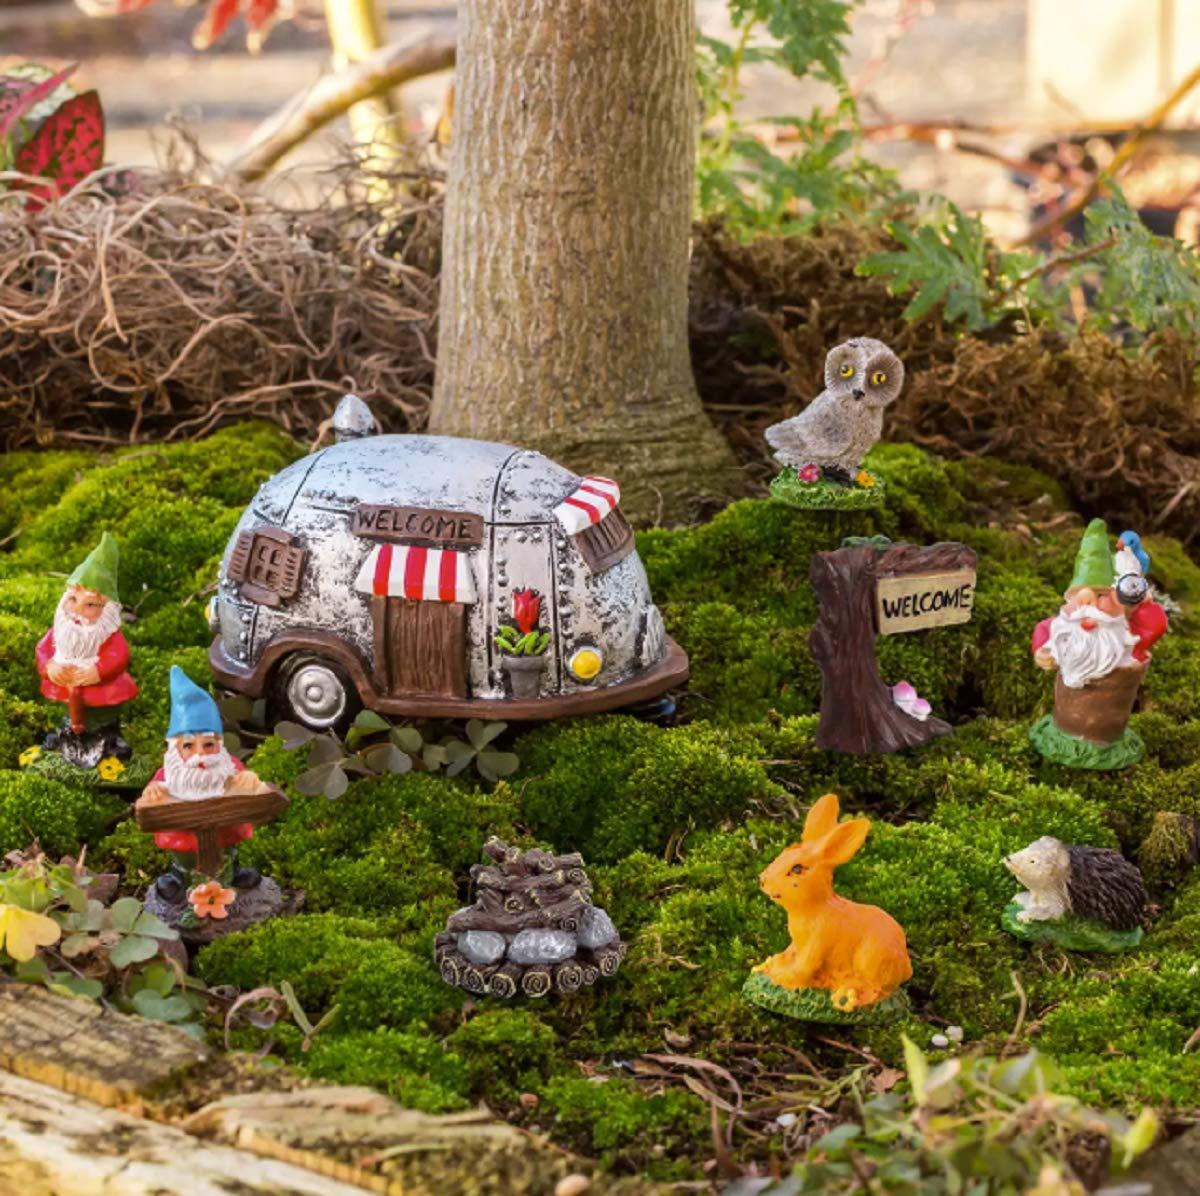 Fairy Garden Gnome Campground Figurine Set, Polyresin, 9 Pieces